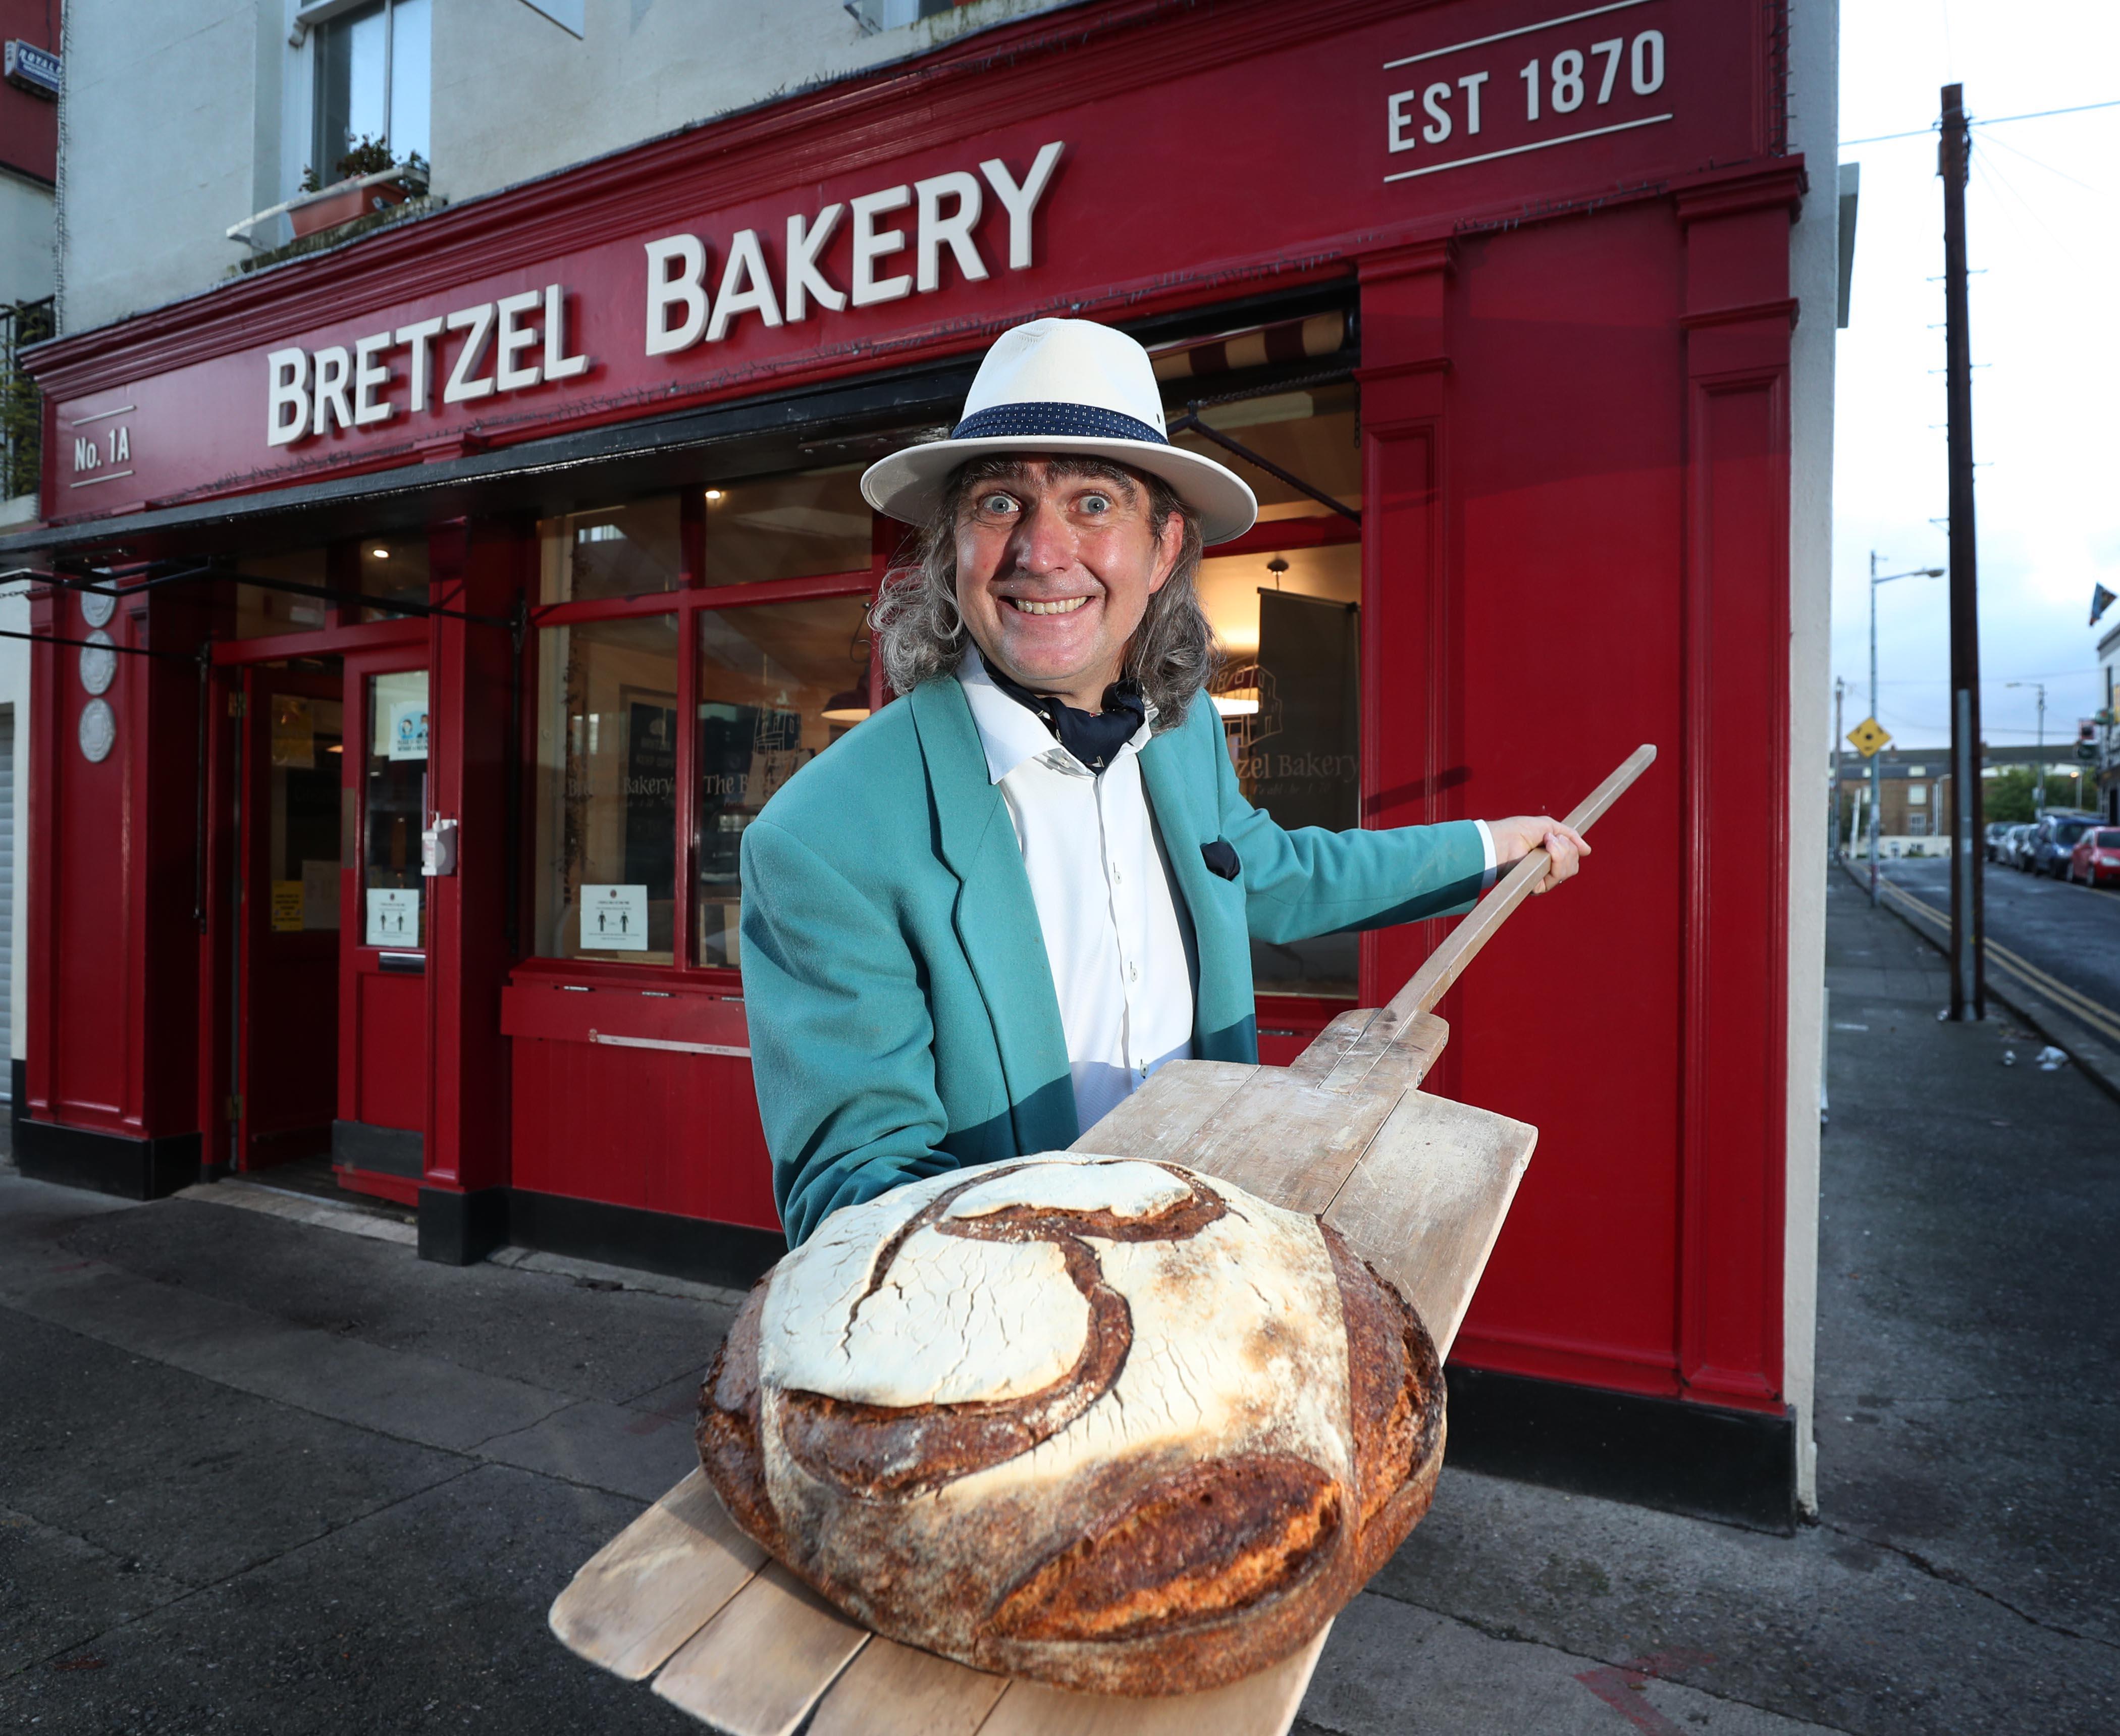 William Despard of Bretzel Bakery